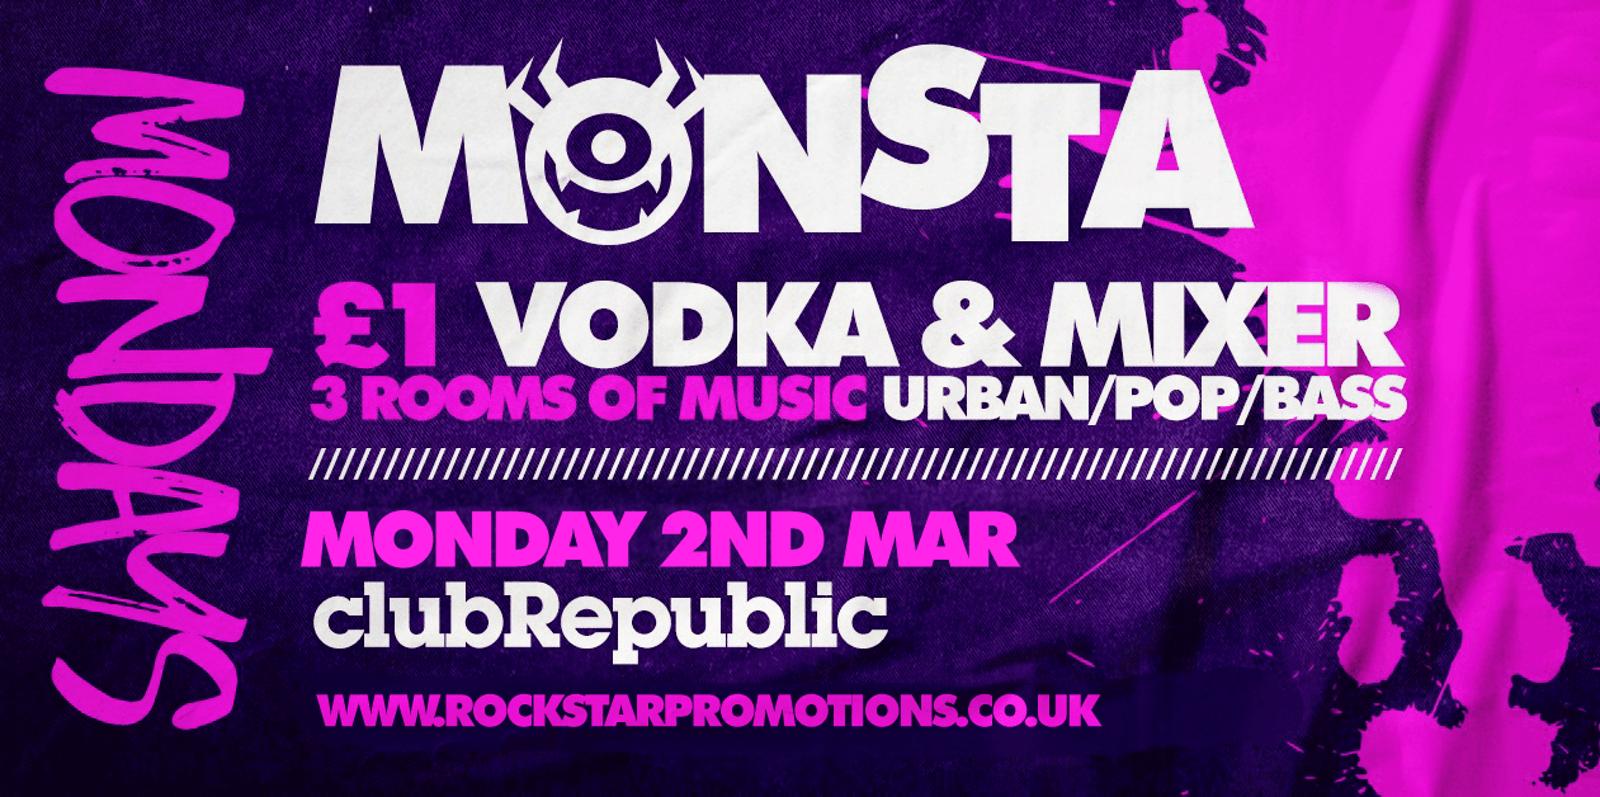 Monsta Mondays at Club Republic! £1 VODKA Mixer! Mon 2nd March